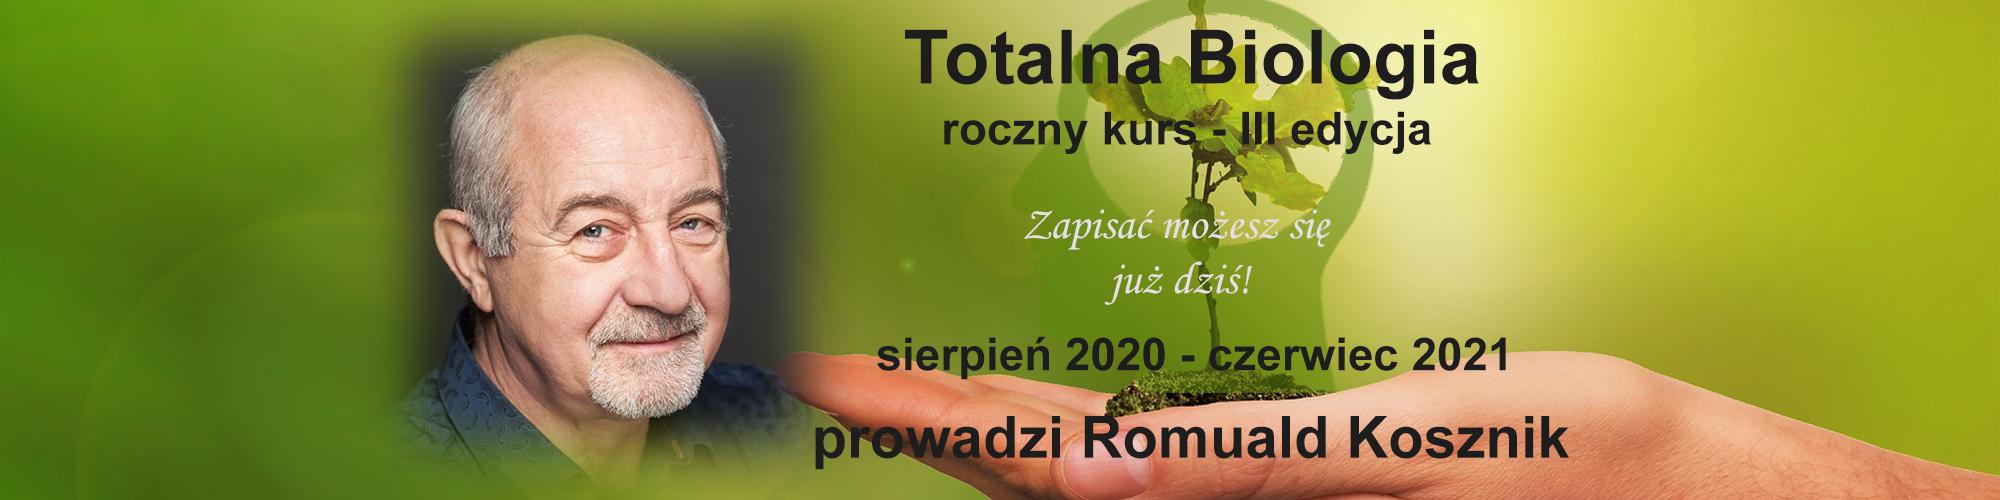 totalnabiologia5-banner